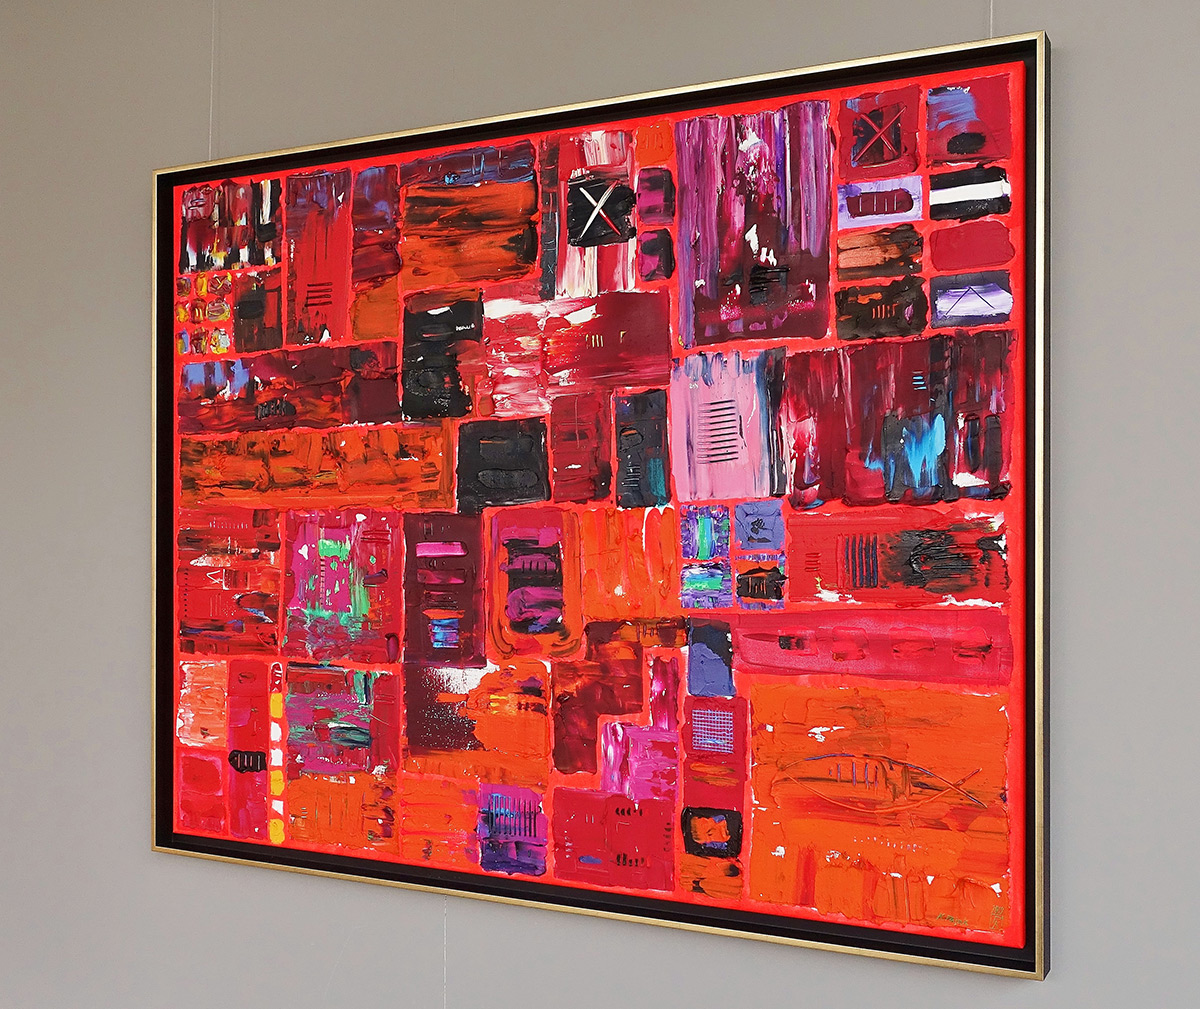 Krzysztof Pająk : DNA codes - Red